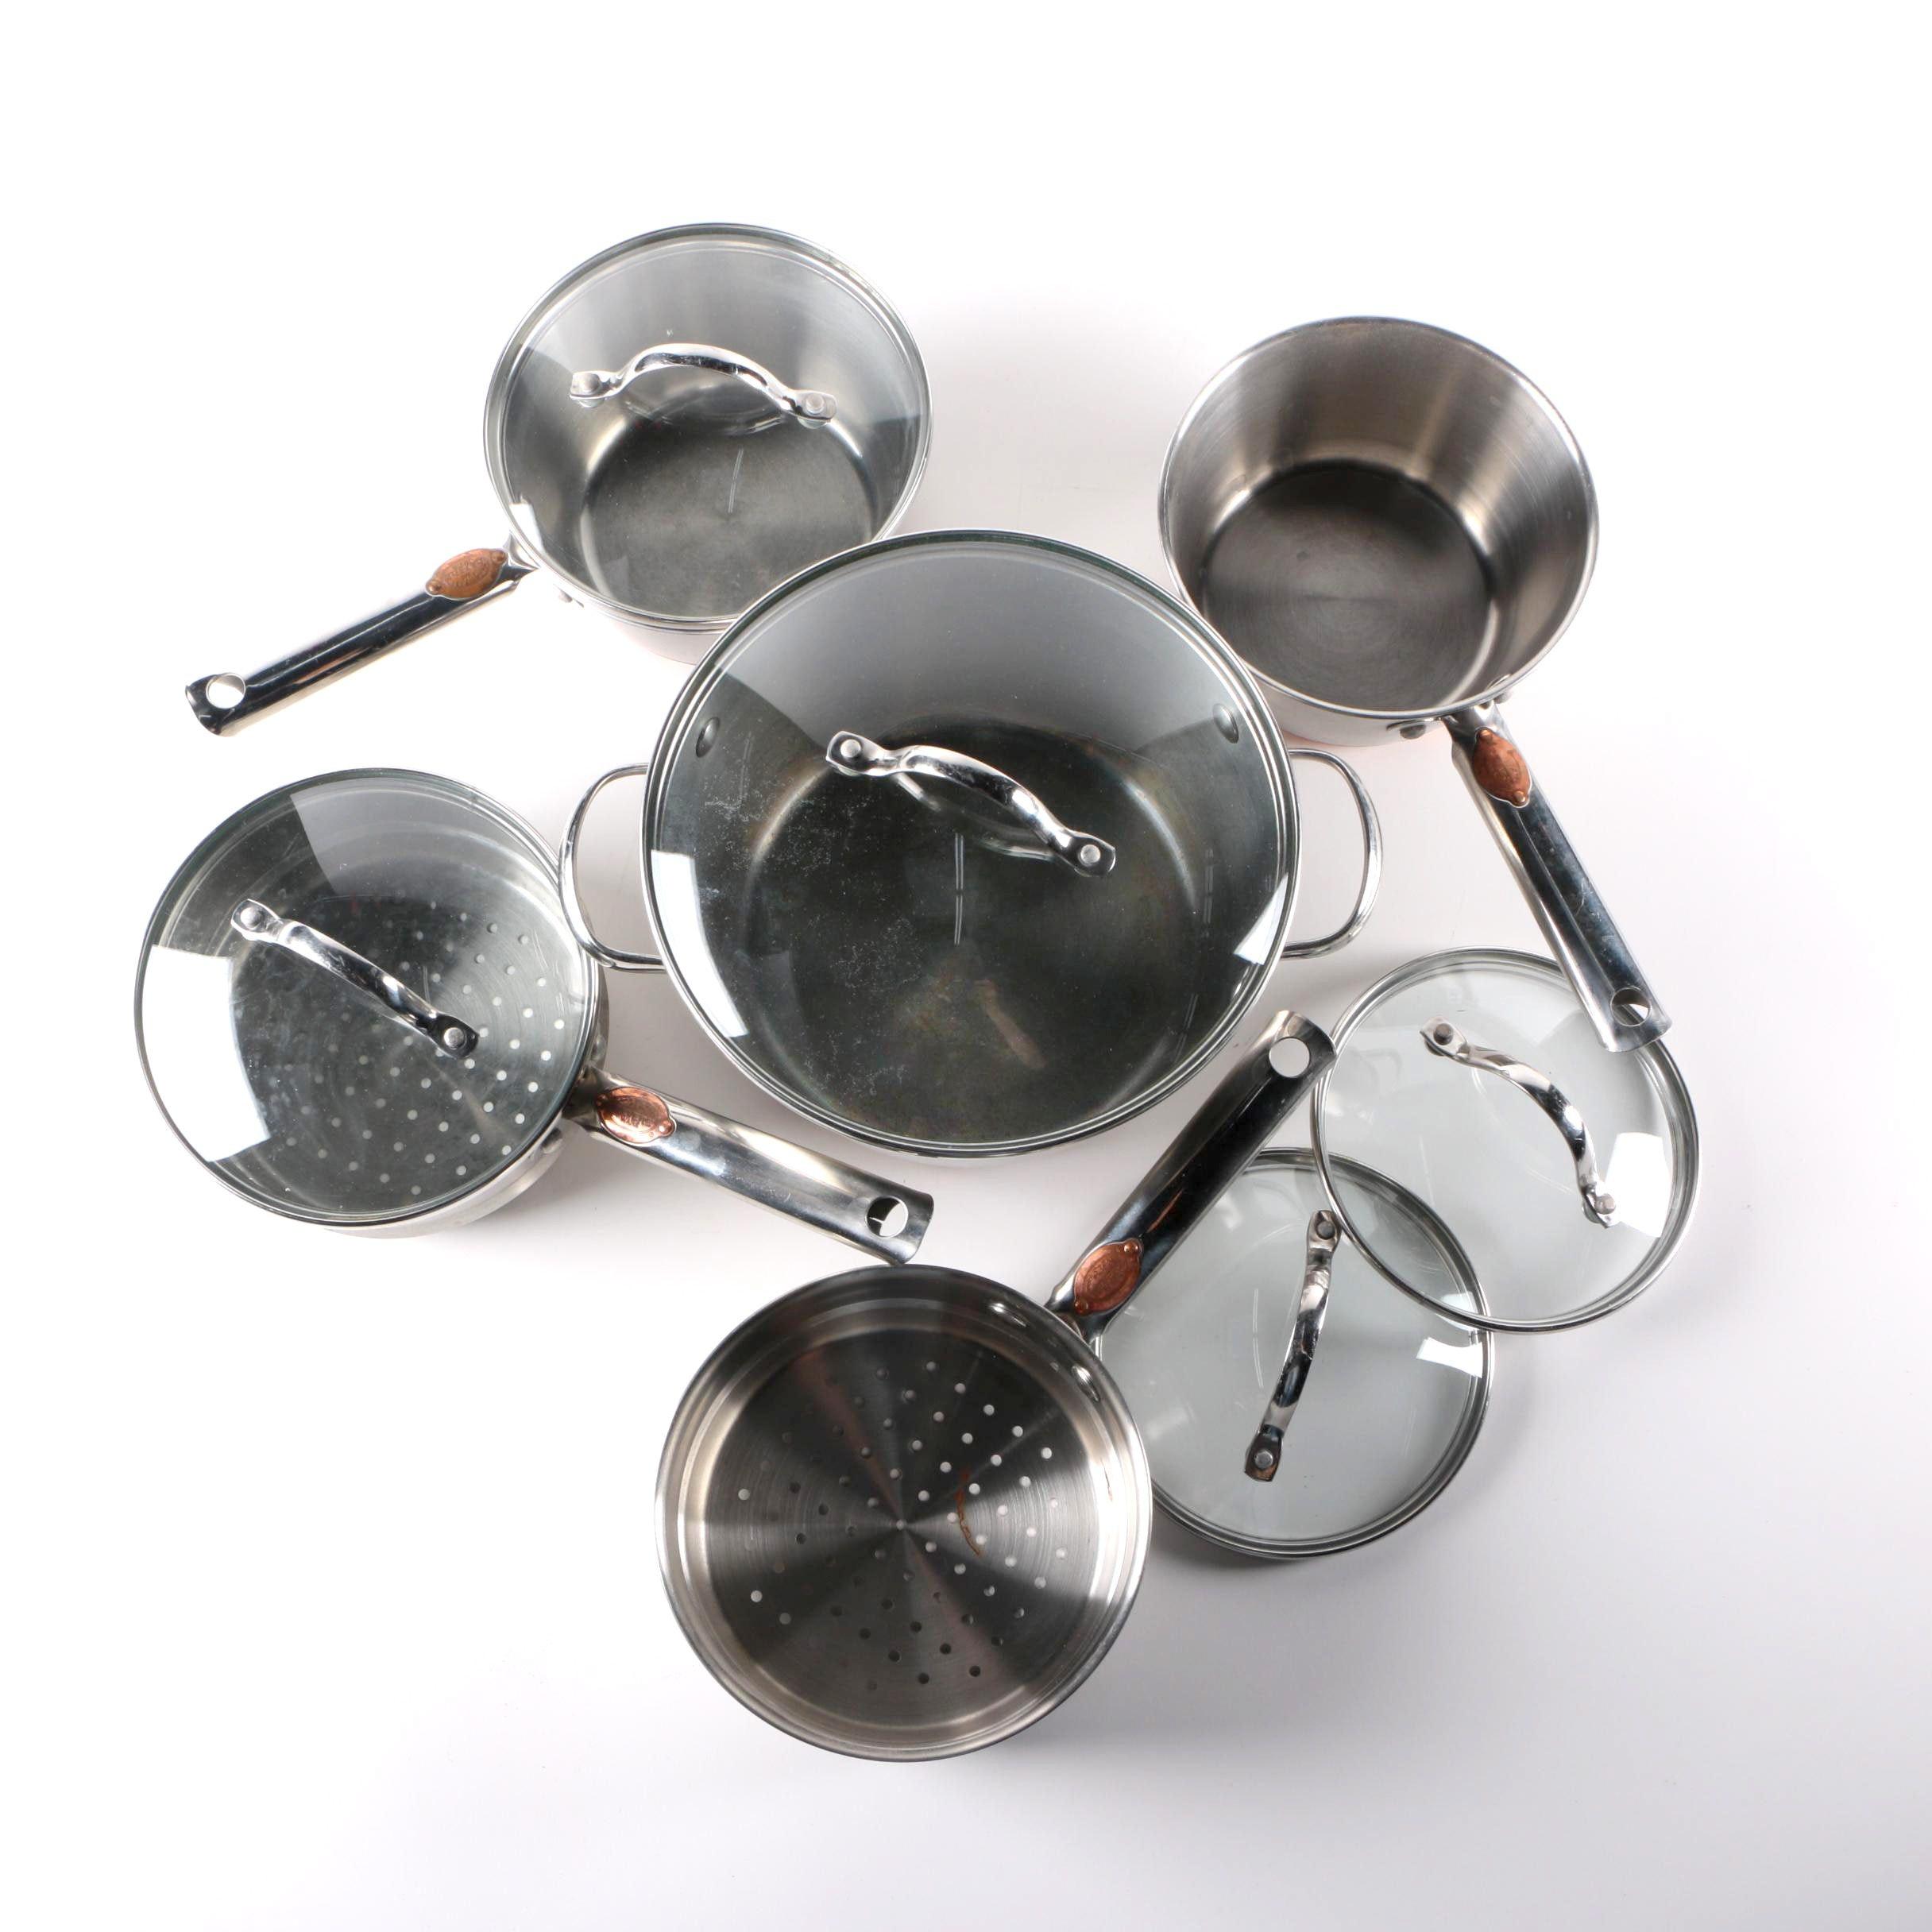 Paul Revere Cookware Set